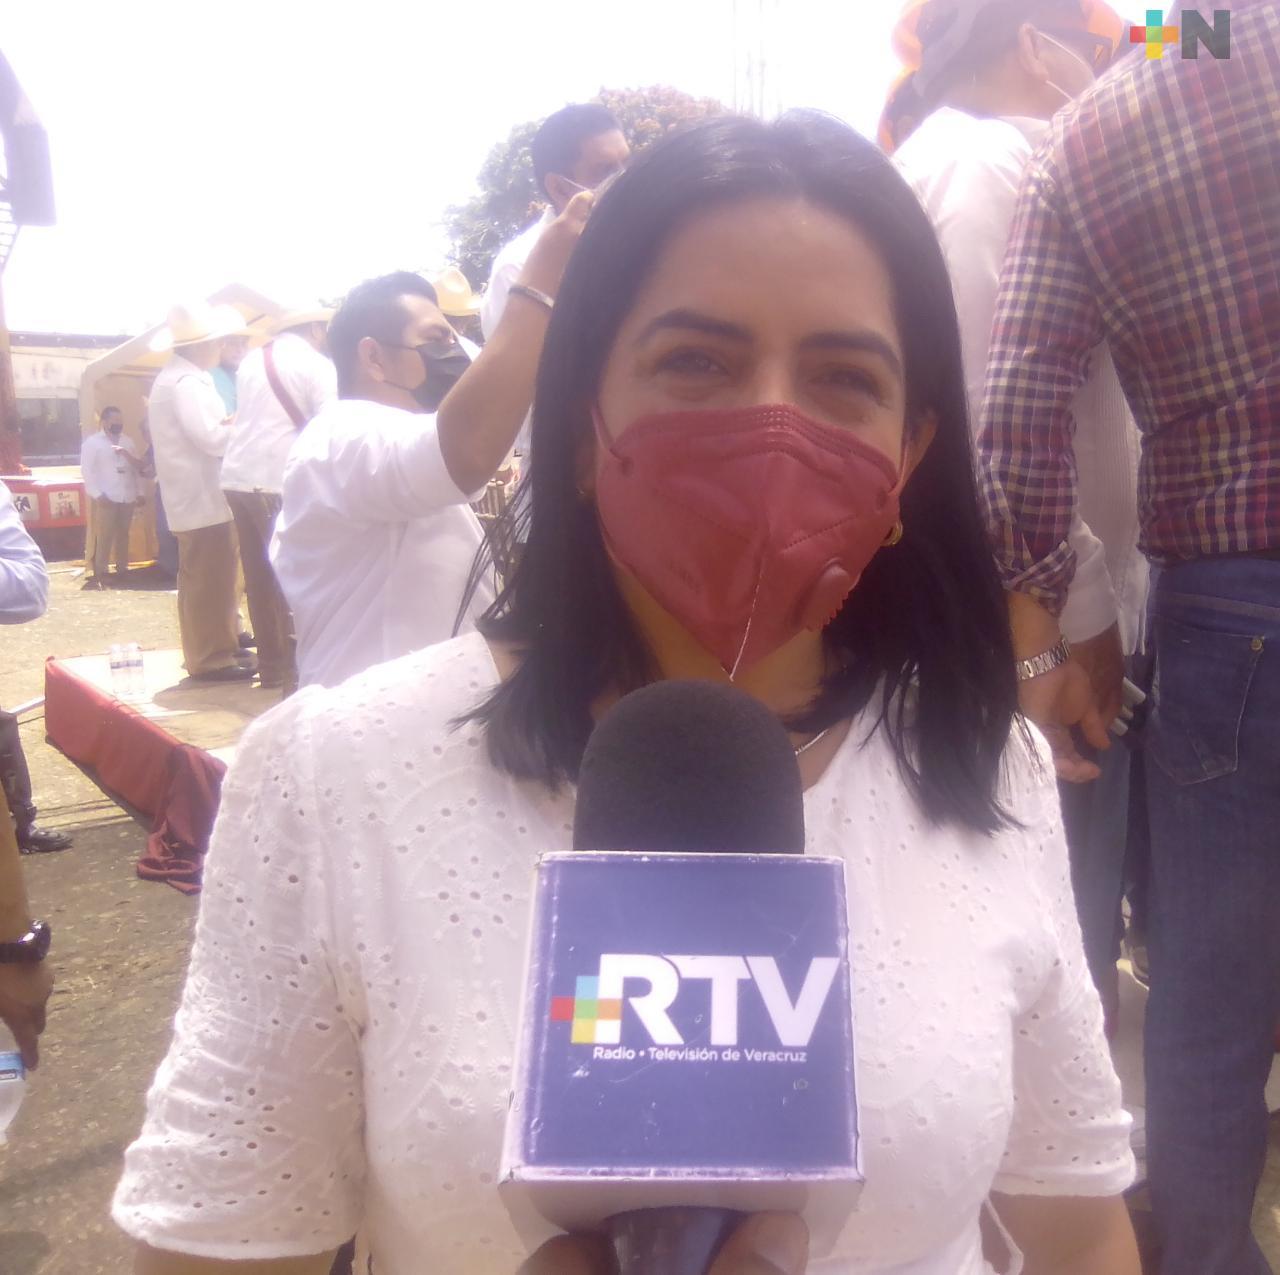 Trabajo legislativo no se ve afectado por licencia de diputados: Linares Capitanachi